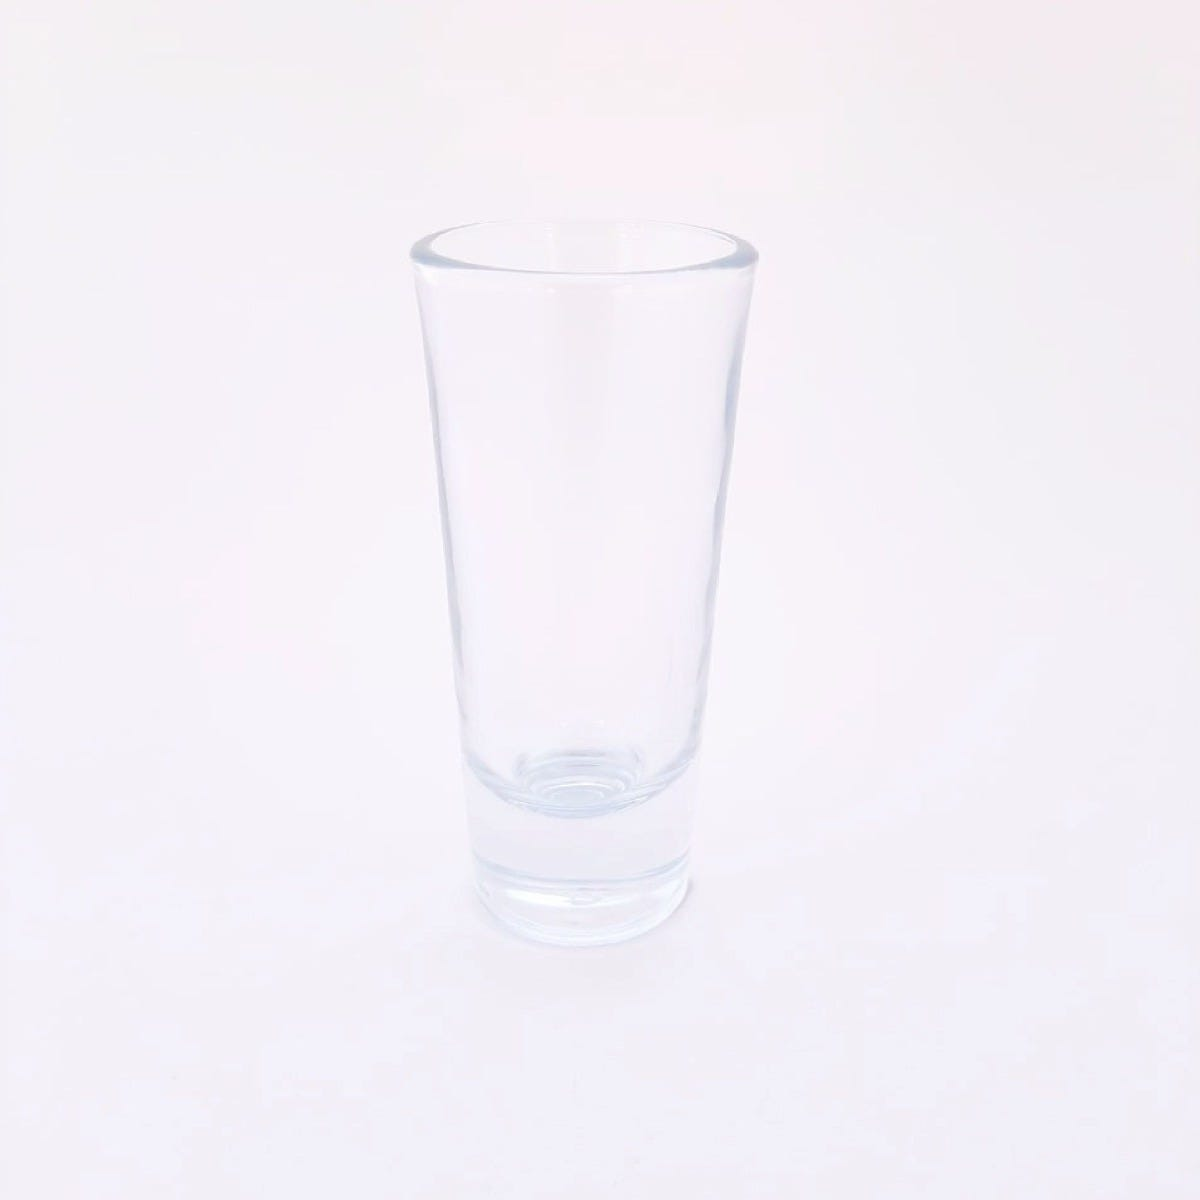 Tequilero Crisa® Mediano 44 mL